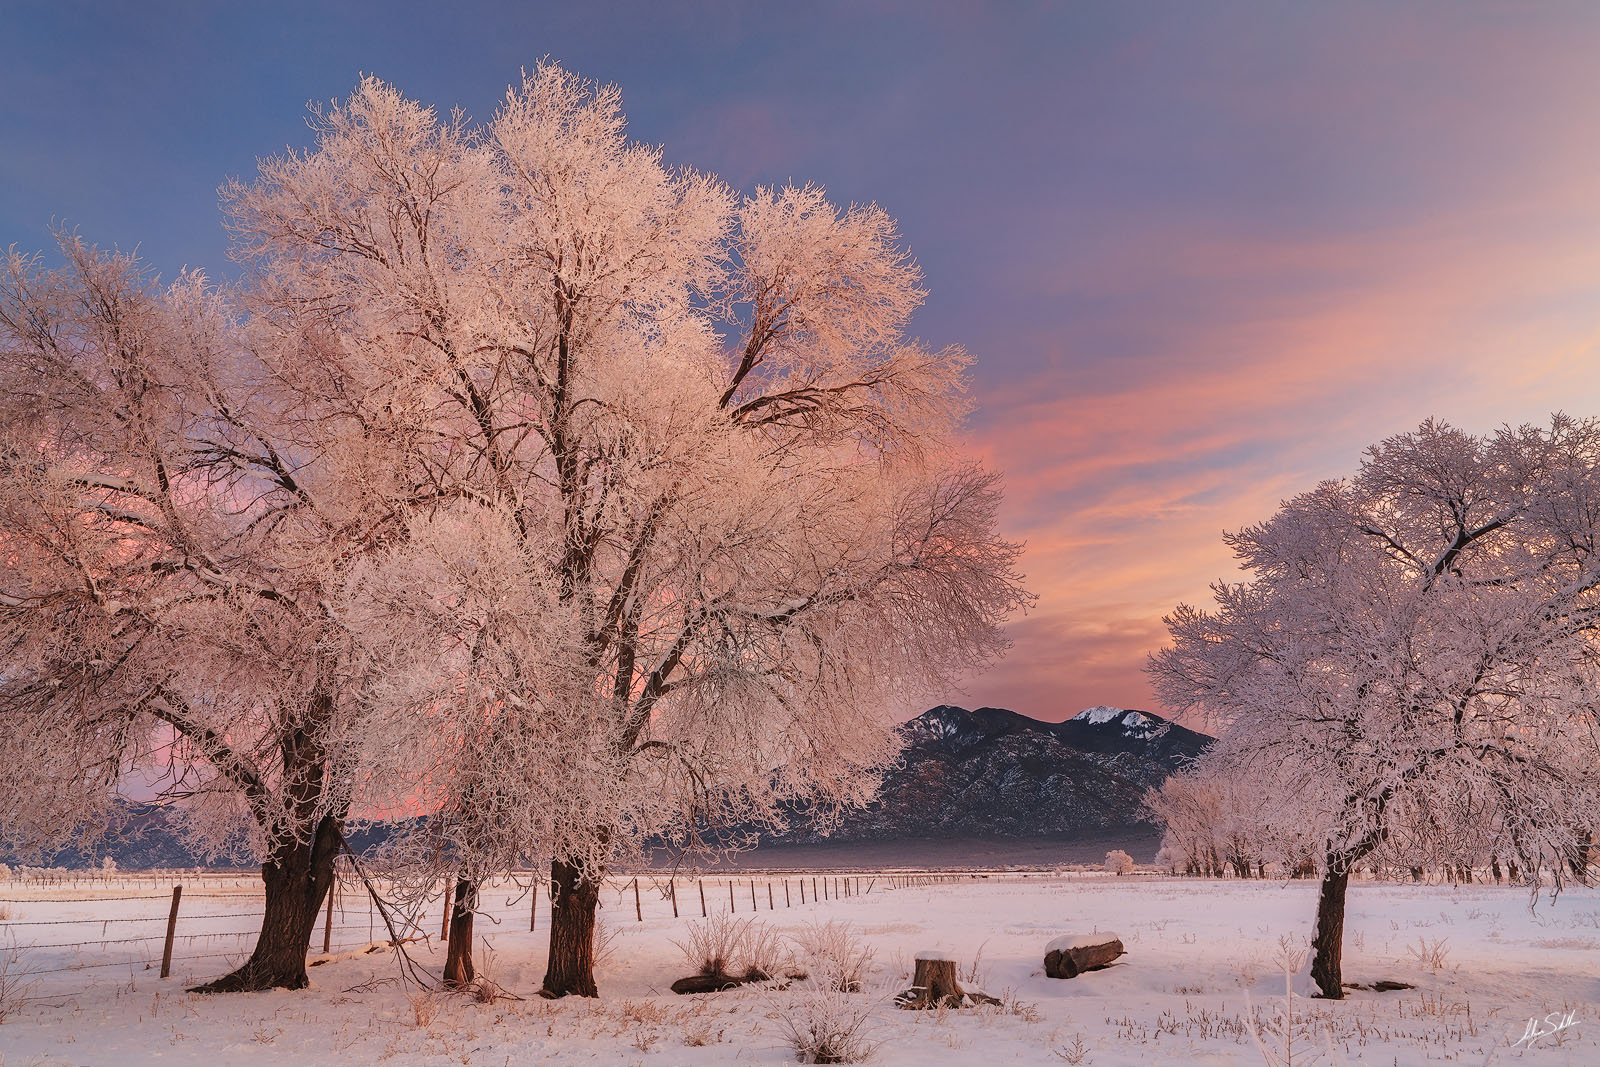 Cottonwood, NM, New Mexico, Pueblo Peak, Sangre de Cristo, Snow, Taos, Taos Mountain, Tree, Trees, Winter, frost, hoar frost, populus deltoides, rime ice, photo